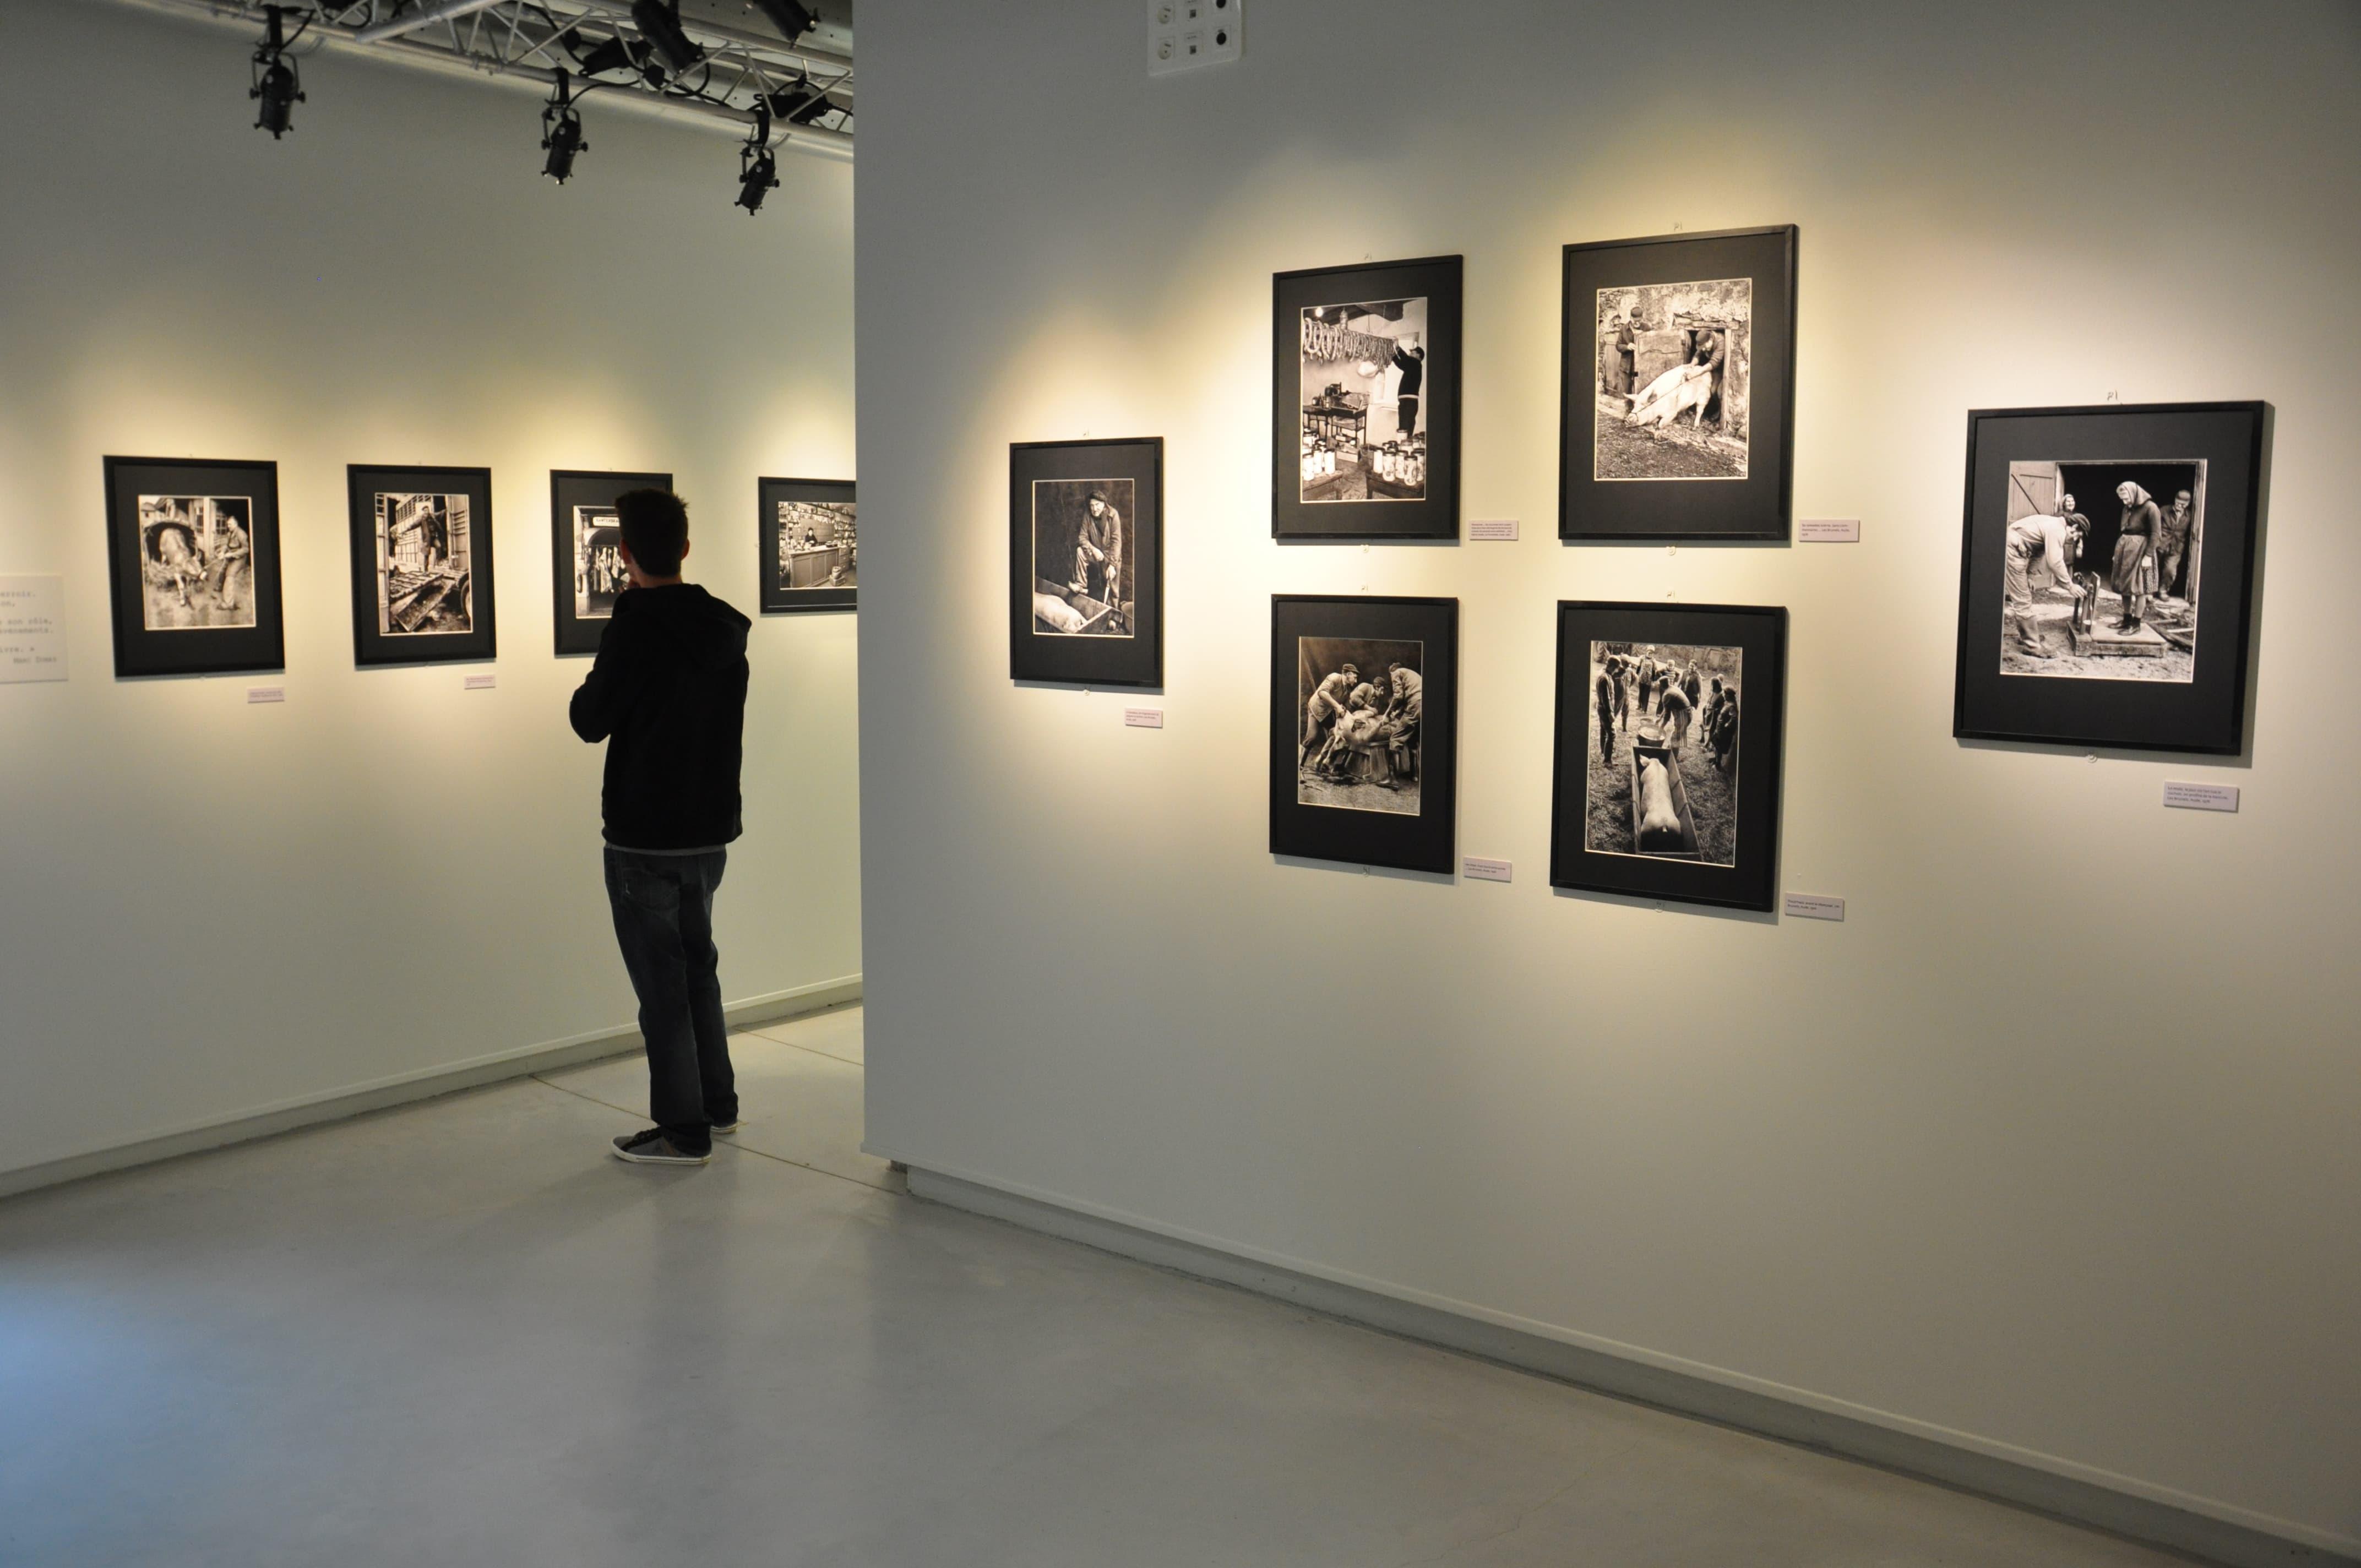 essarts espace arts et cultures bram exposition expo